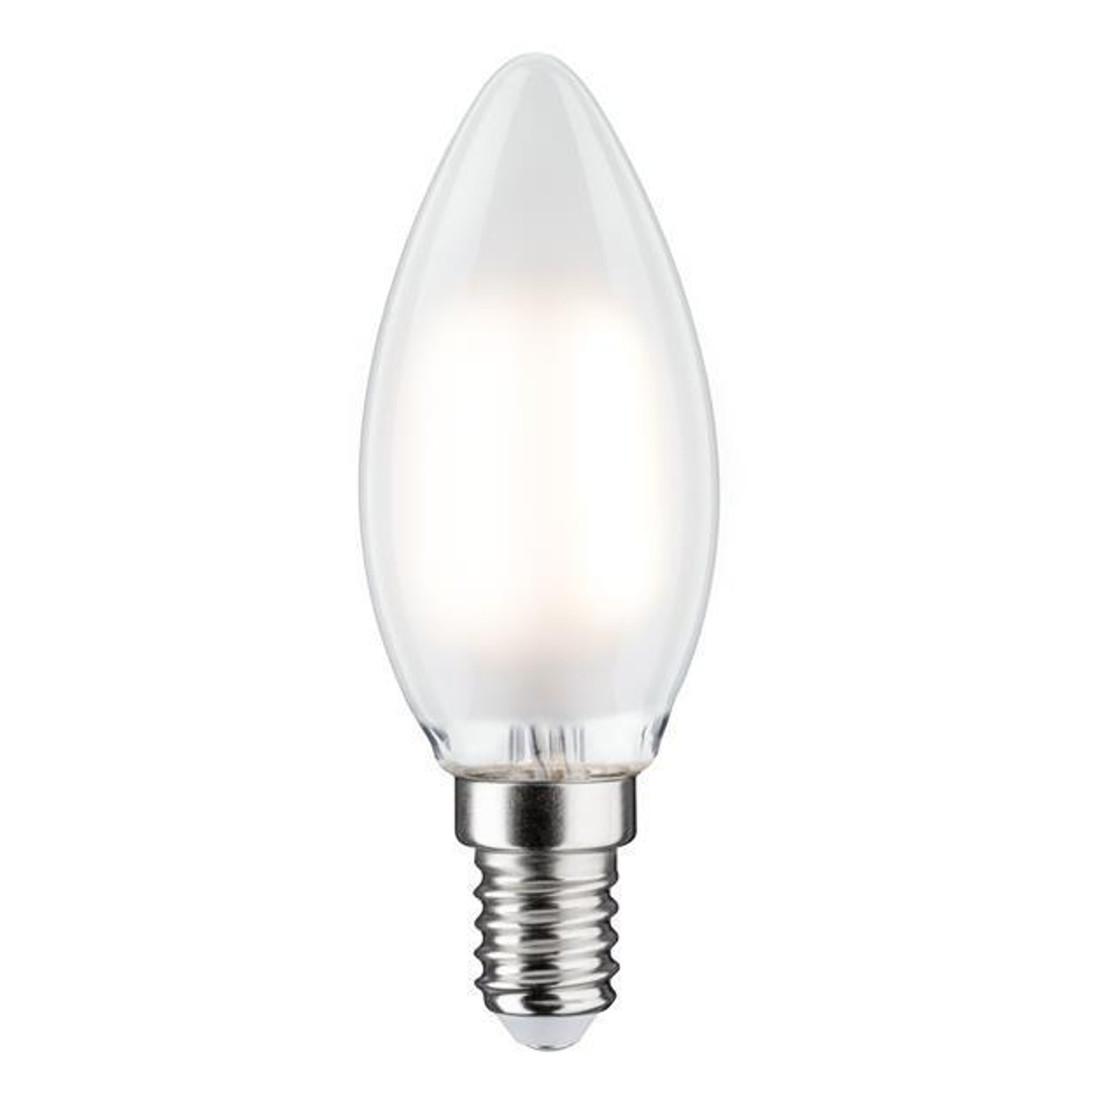 paulmann led kerze 2 5 w e14 230v satin 2700k sparlampe kerzen 4 99. Black Bedroom Furniture Sets. Home Design Ideas